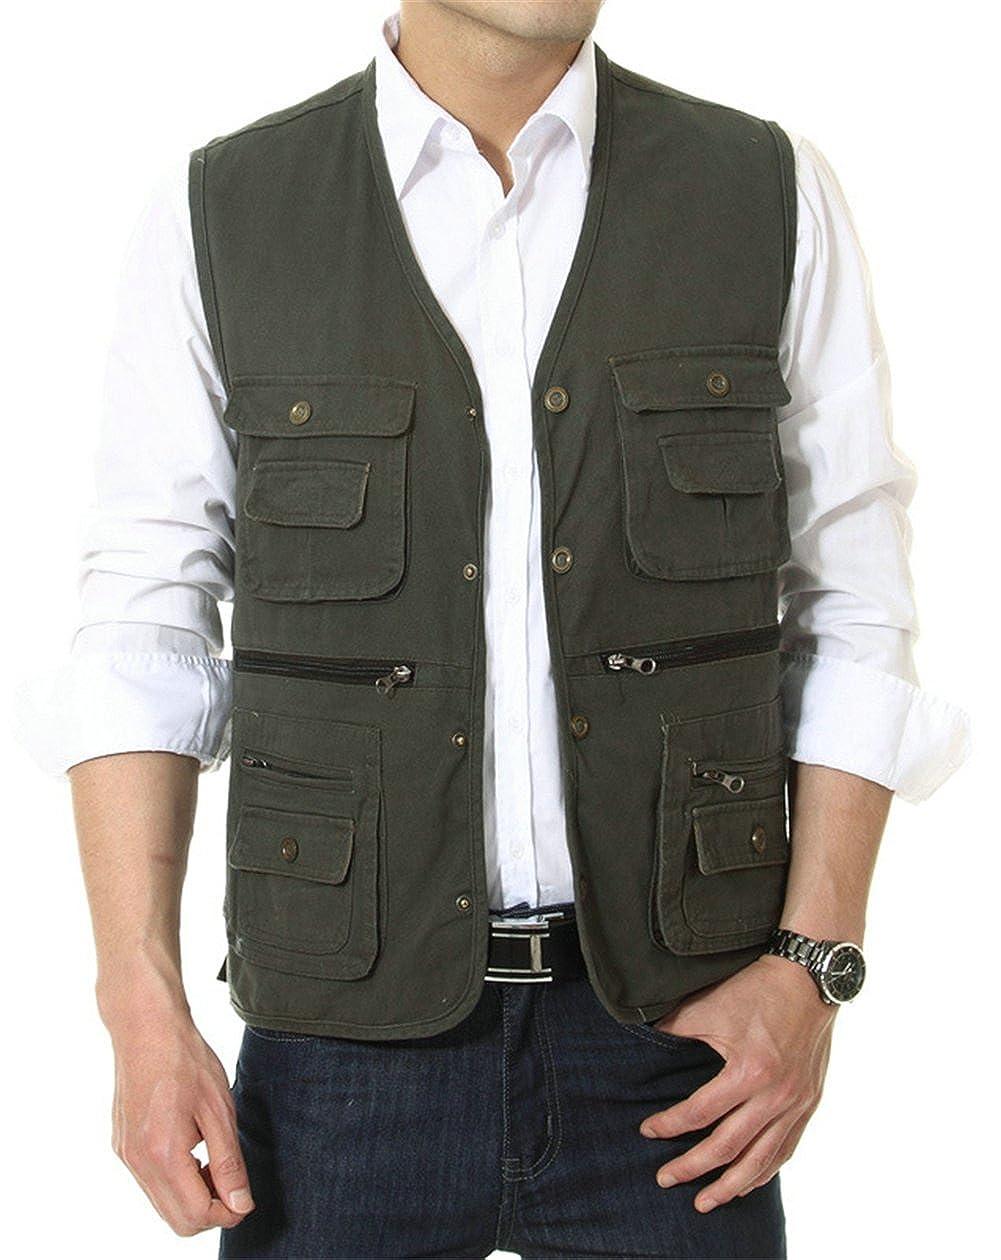 TALLA CN XL / US S. APTRO chaleco 100% algodón con varios bolsillos para hombre